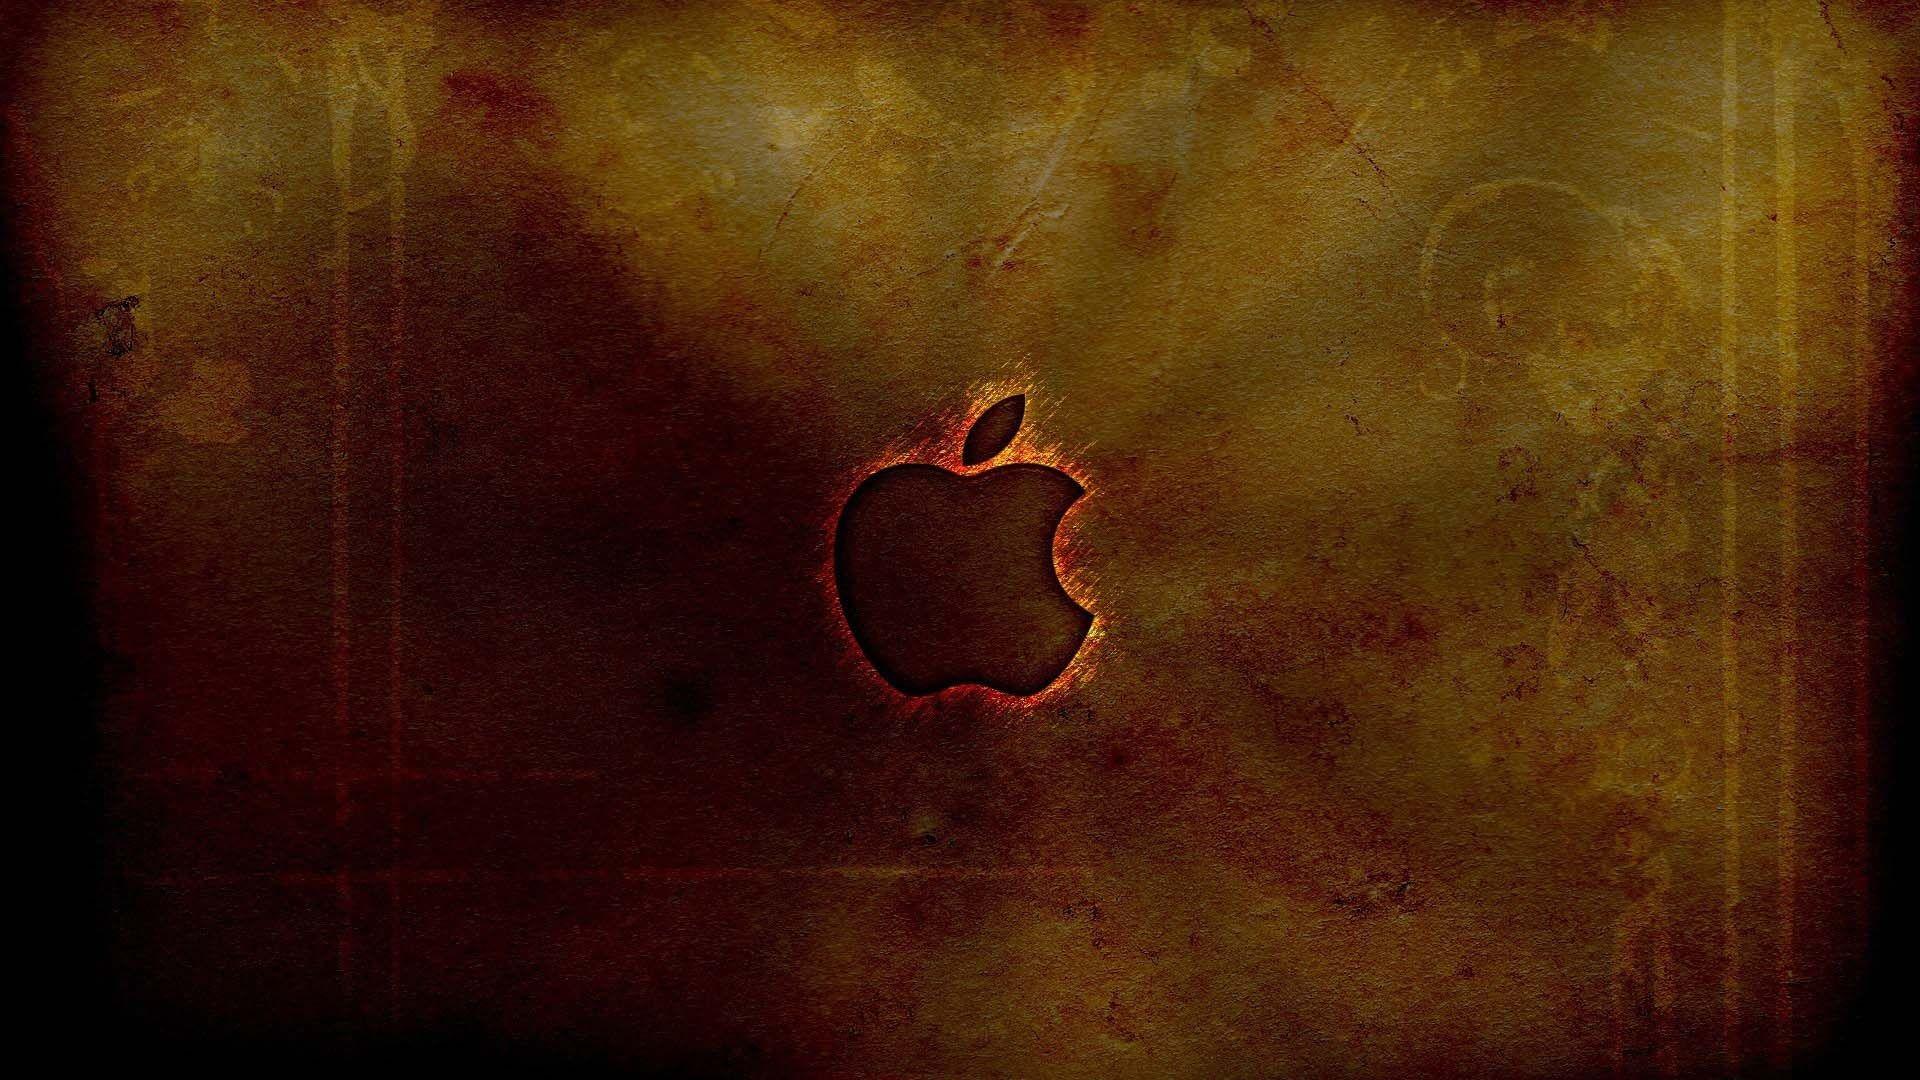 Apple 3d Fire   Mcintosh 1979359   HD Wallpaper Download 1920x1080